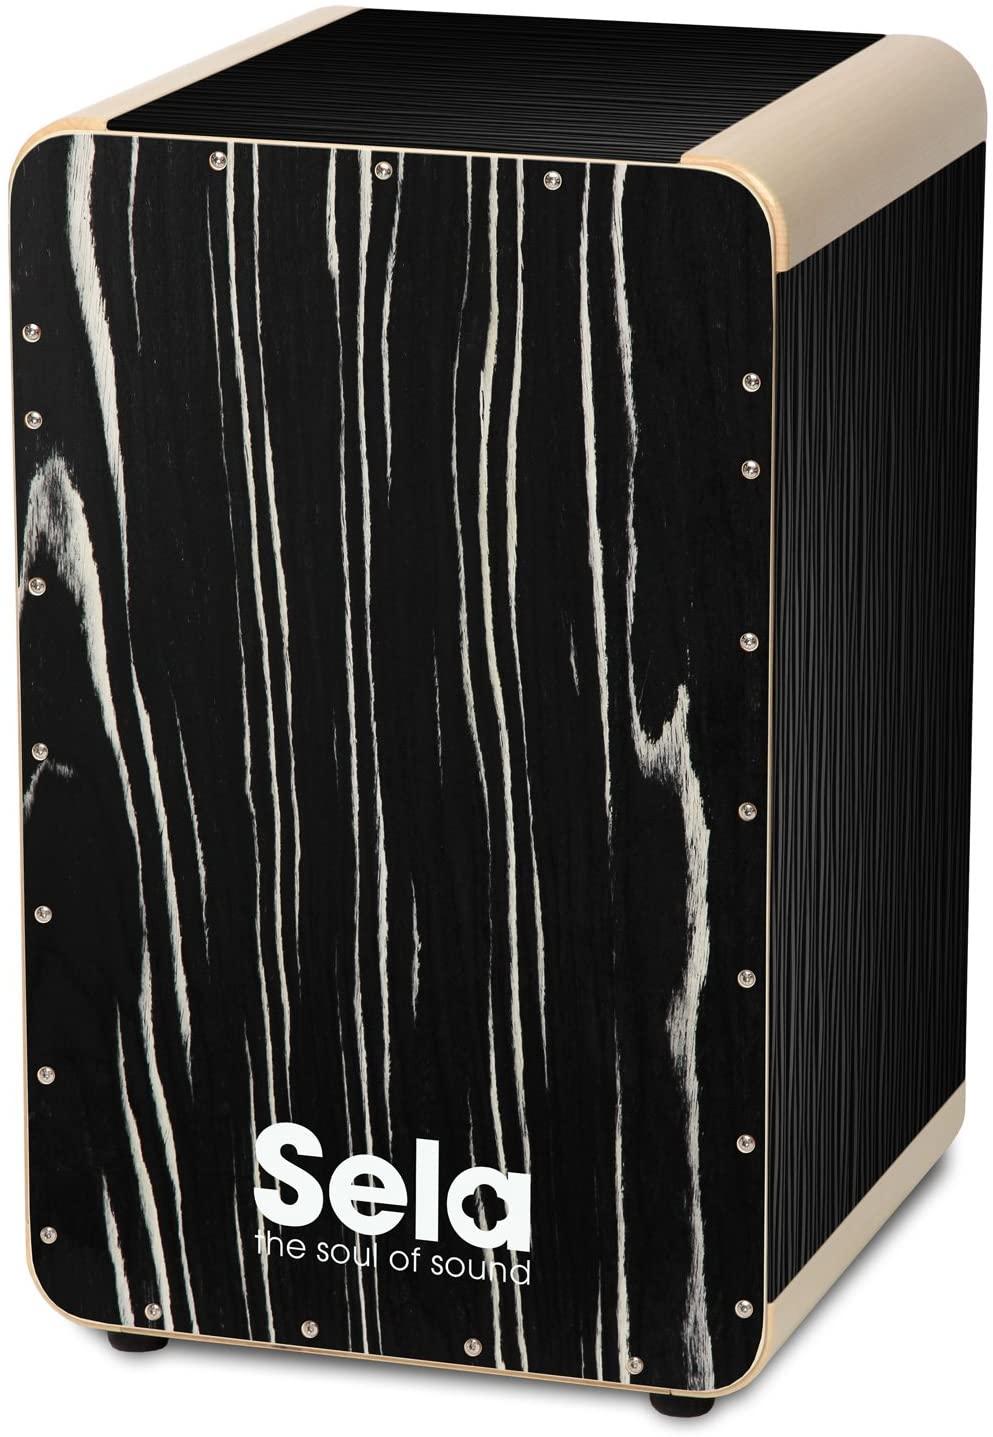 Sela SE 024 Wave Black Makassar Professional Snare Cajon